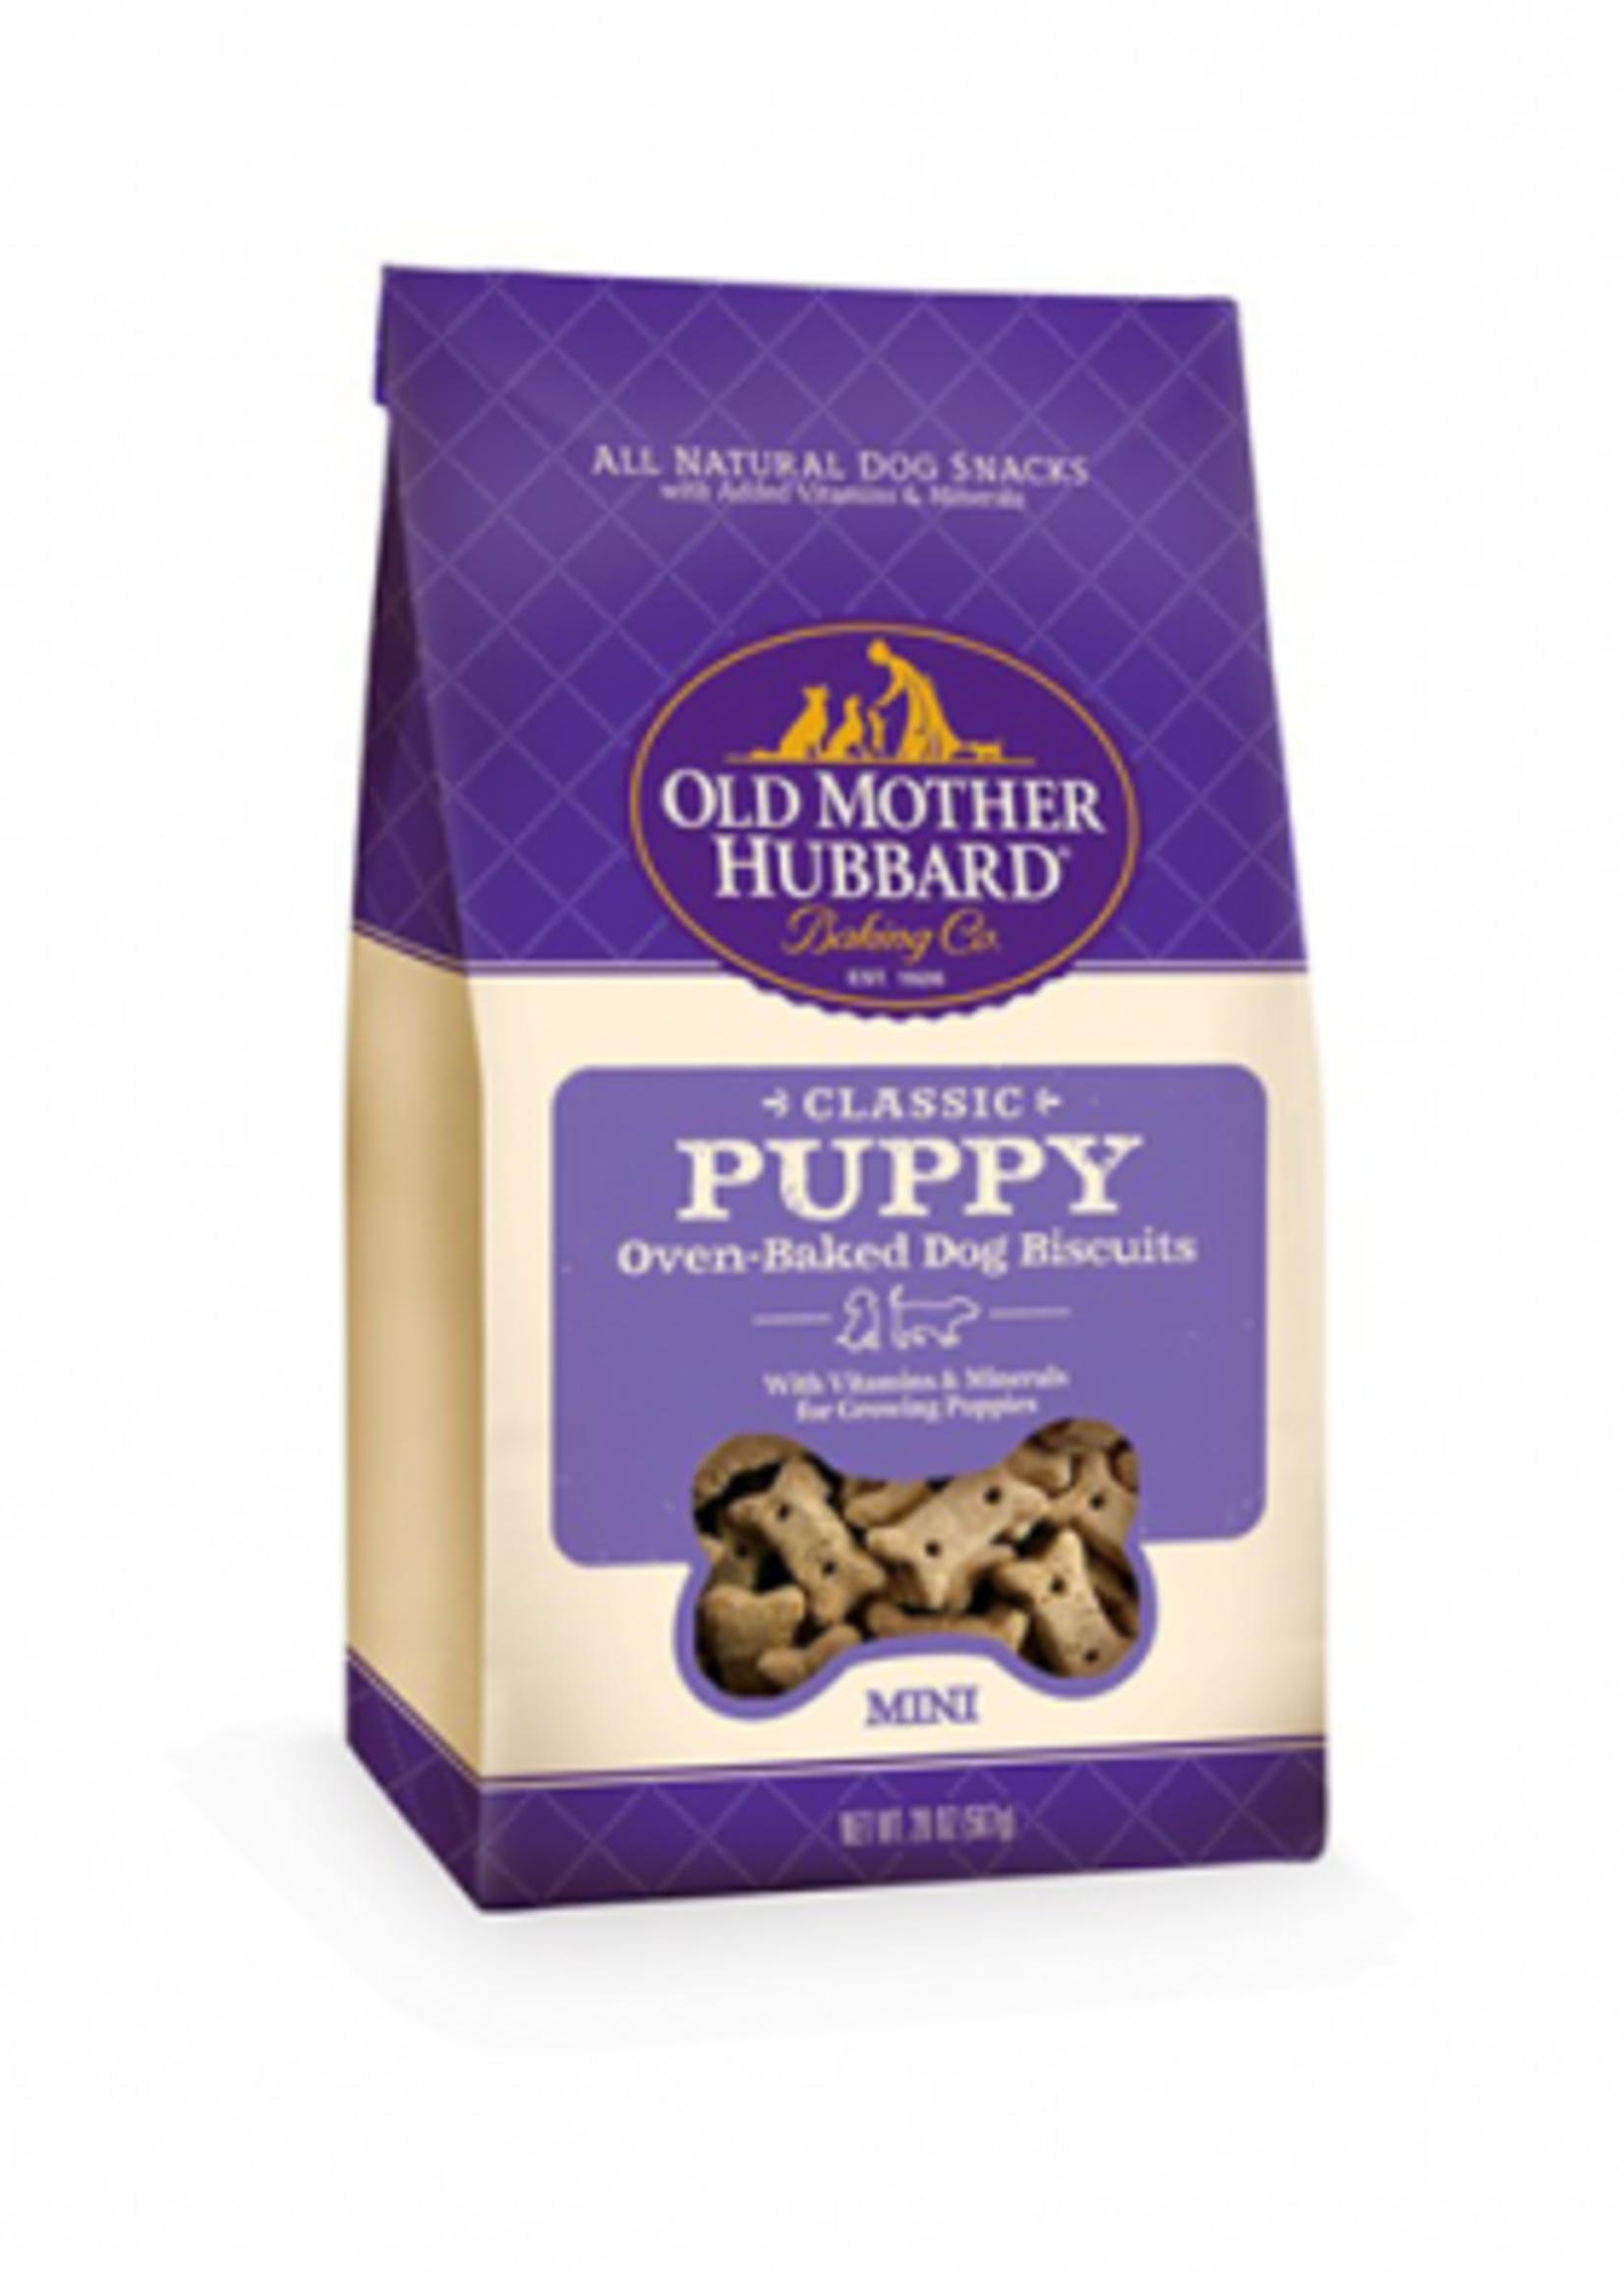 Old Mother Hubbard Puppy Mini 20 oz